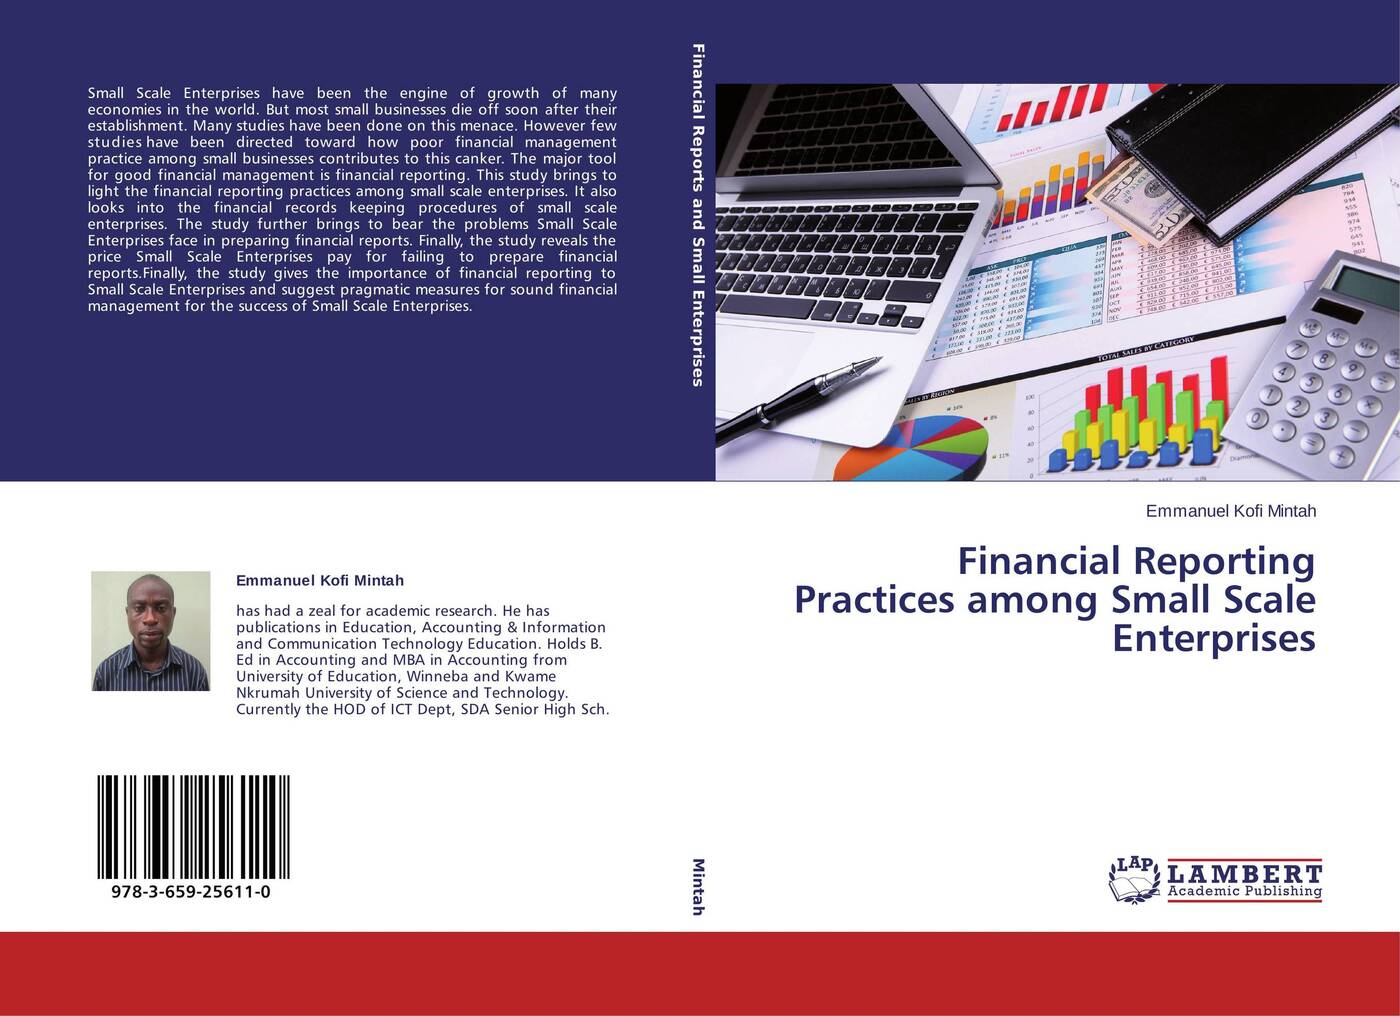 Emmanuel Kofi Mintah Financial Reporting Practices among Small Scale Enterprises